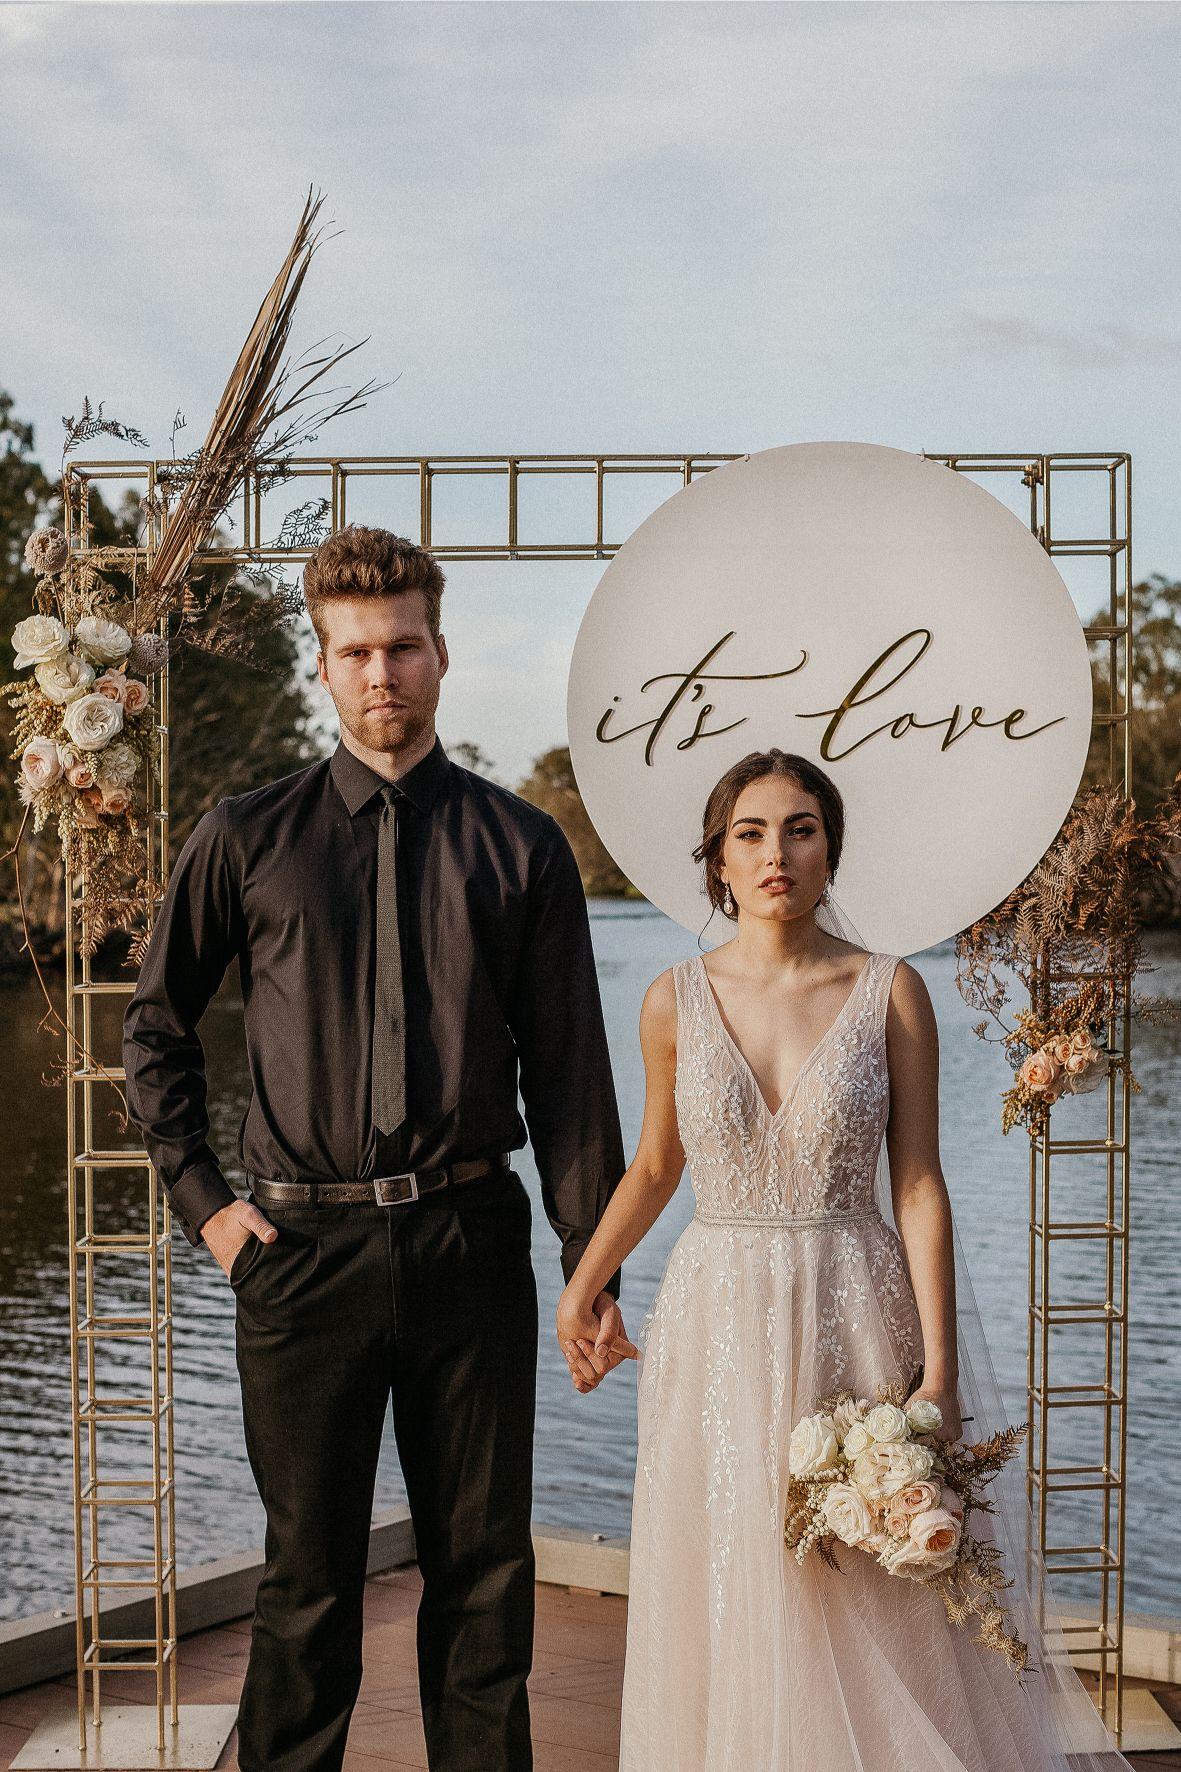 STYLED SHOOT: IT'S LOVE | AUTUMN APRICOT HUES WEDDING EDITORIAL PERTH WA